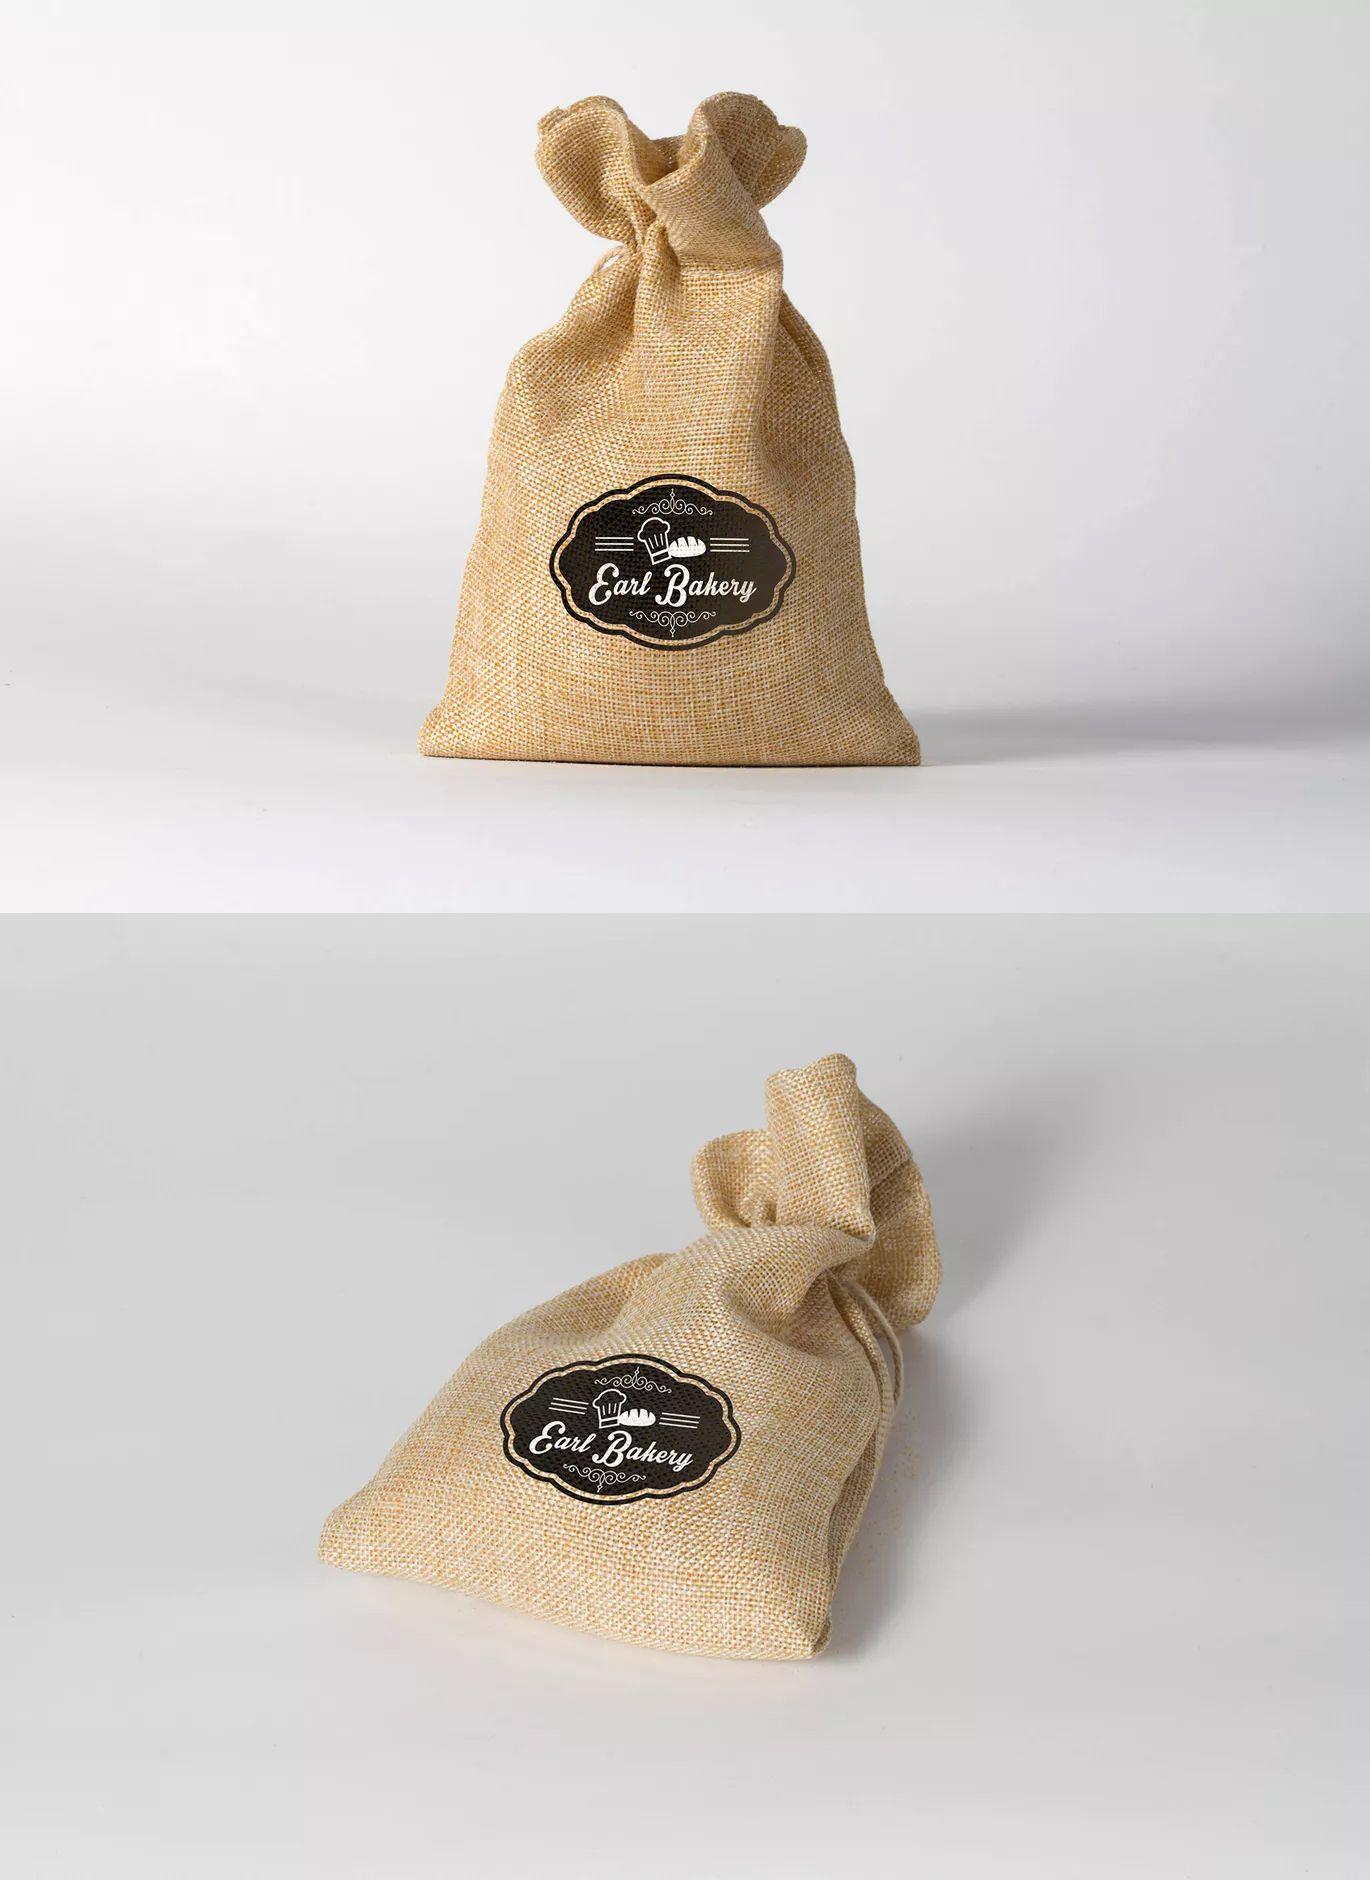 Download Craft Grains Bag Mock Up By Retrobox On Envato Elements Bags Crafts Mocking